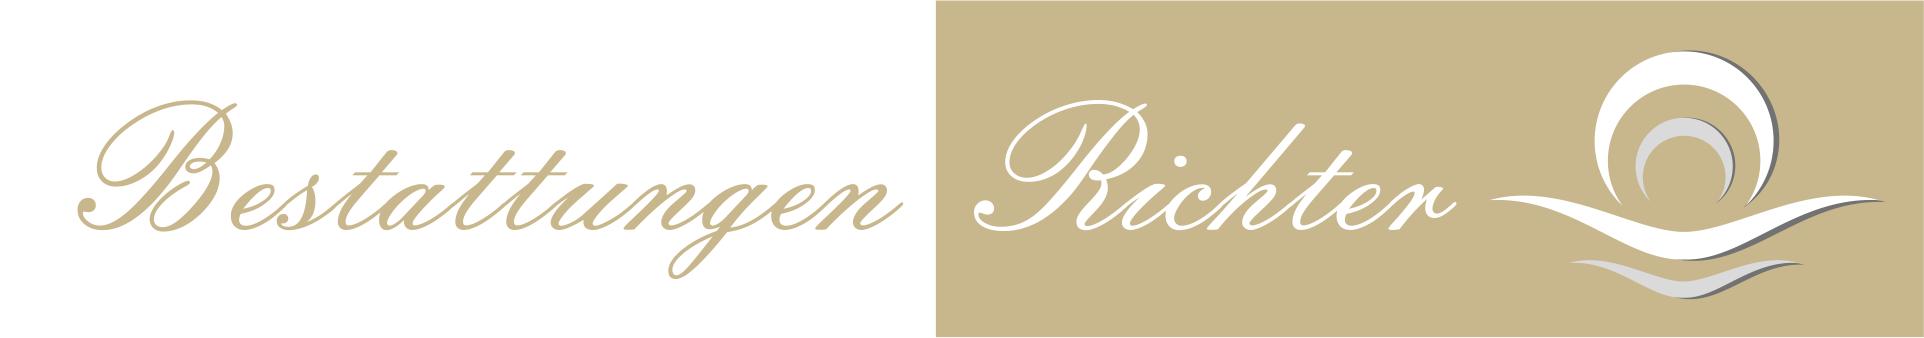 Bestattungen Richter Logo